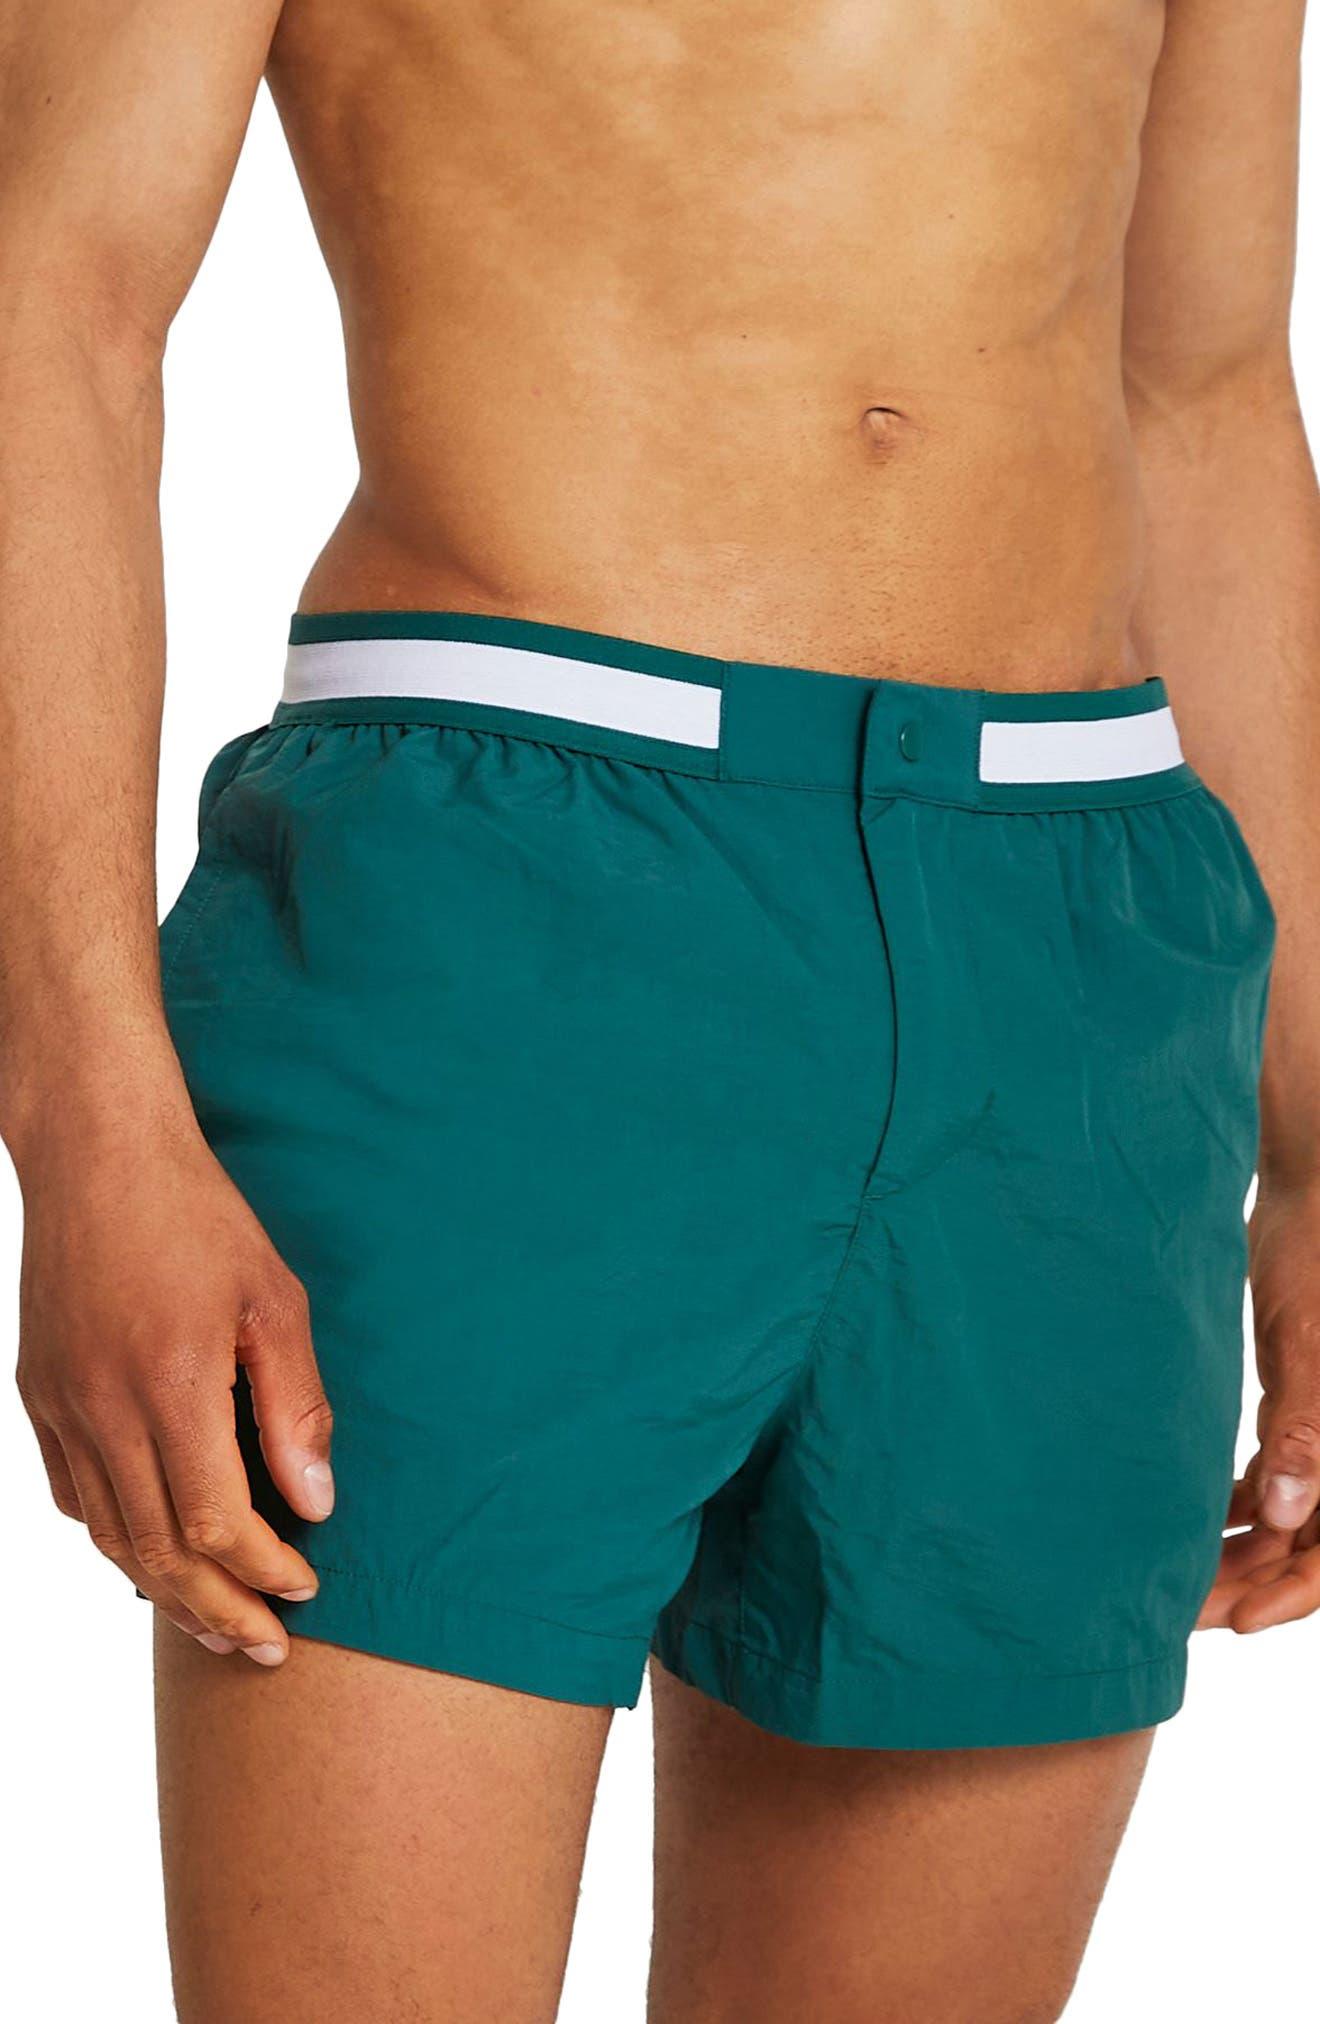 Vintage Men's Swimsuits – 1930s, 1940s, 1950s History Mens River Island Taped Swim Shorts Size Medium - Green $48.00 AT vintagedancer.com